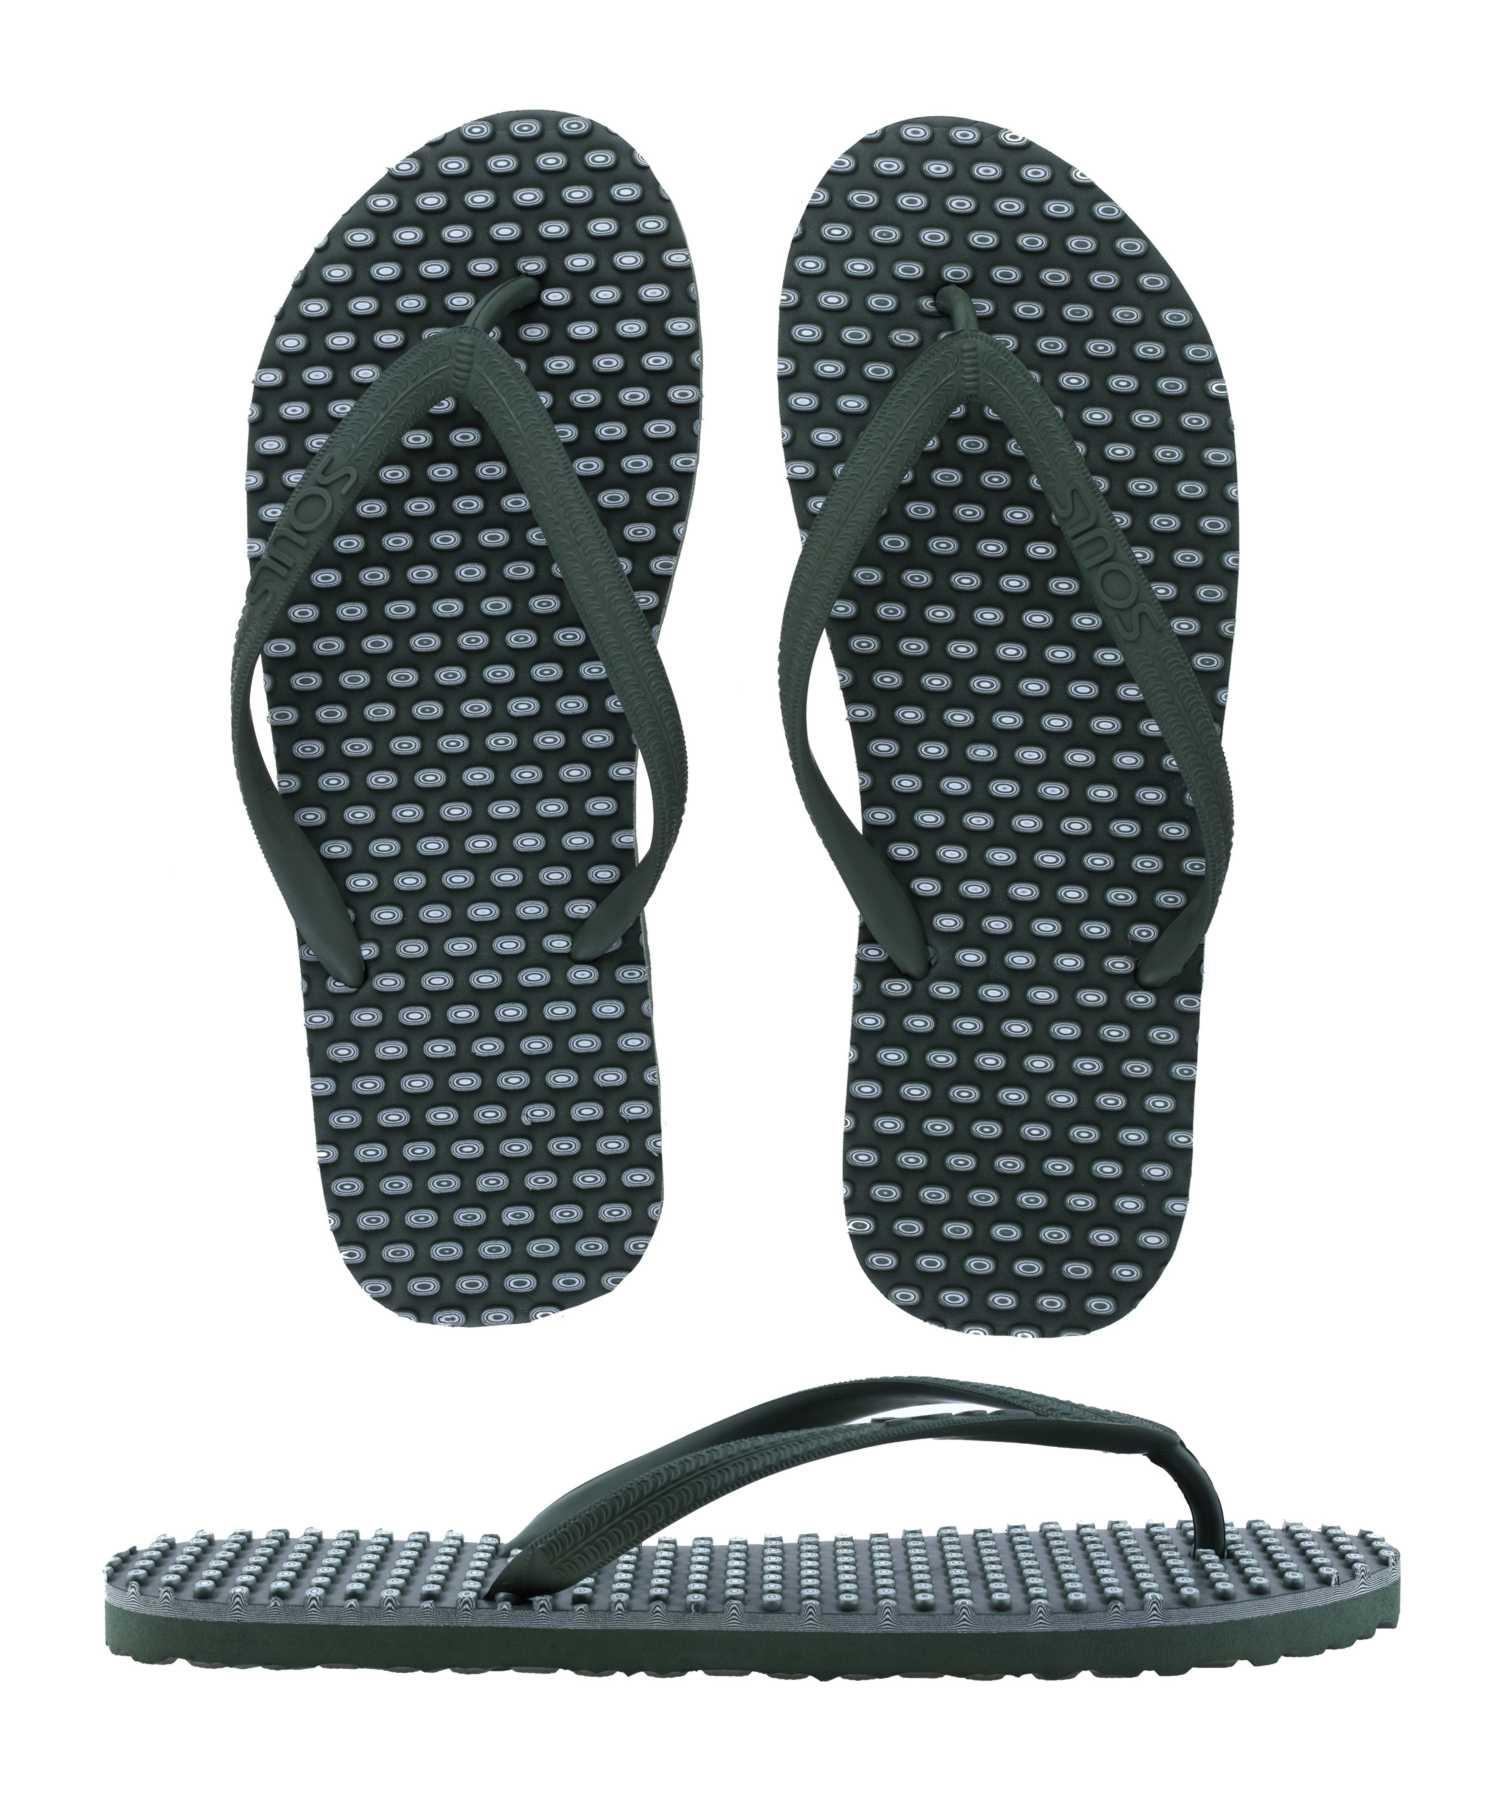 "SOULS Australian Thongs Zehentrenner Unisex Comfort Massage Noppen Sohle ""Outdoor Green"" Sandale Wellness Badeschuhe"